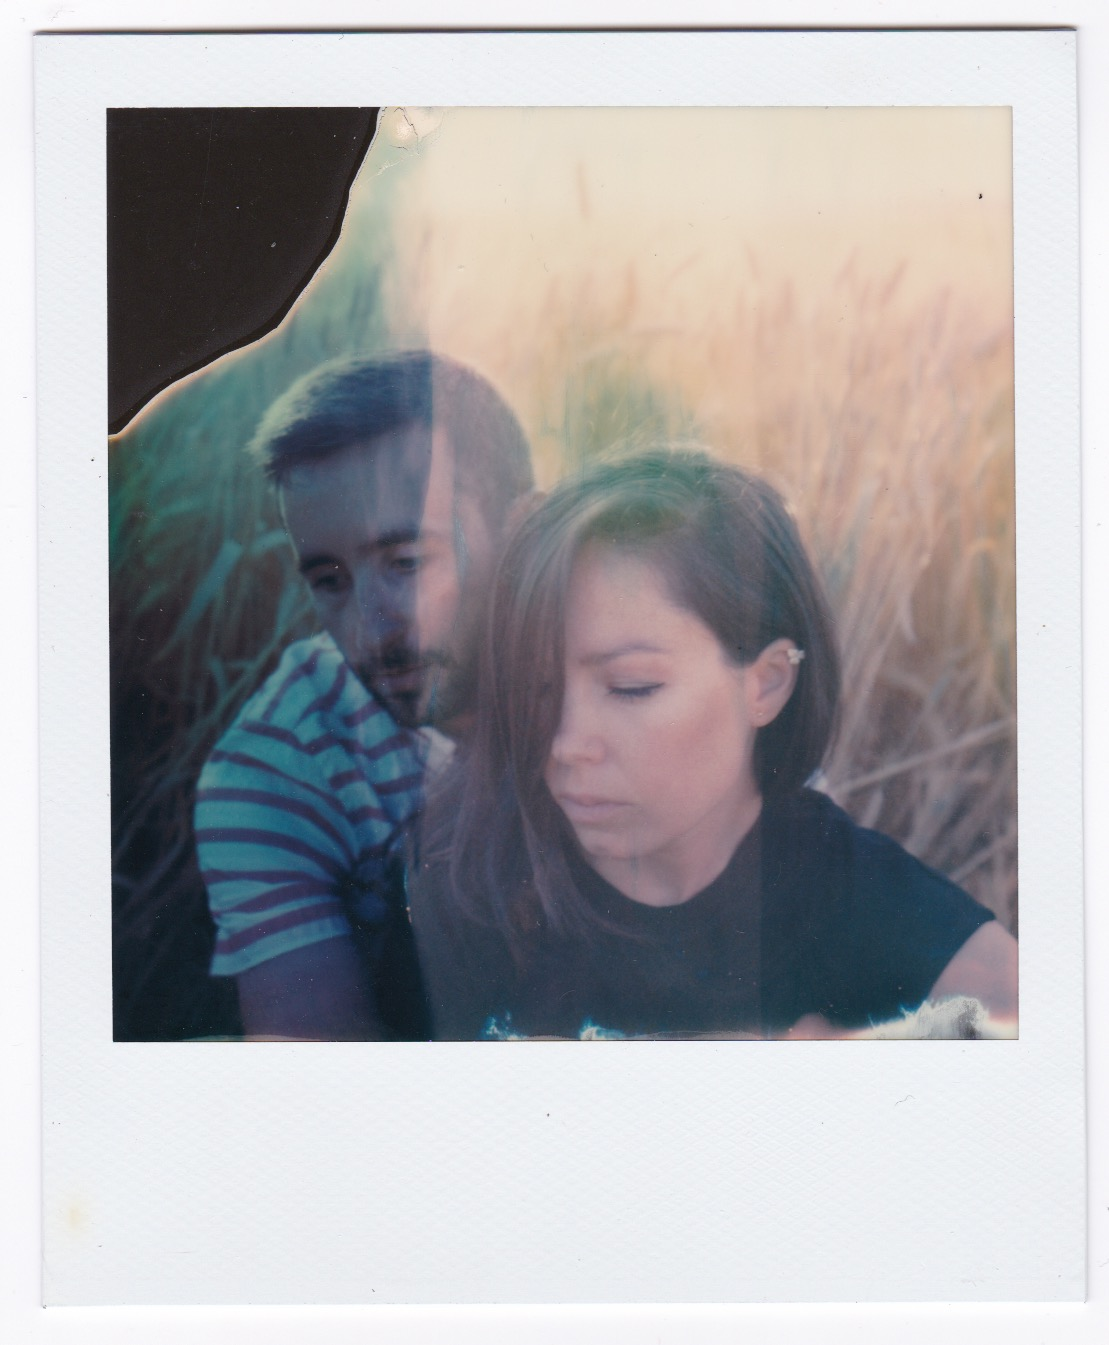 Nono&Ana,  El Palmar  2018  Polaroid SX 70